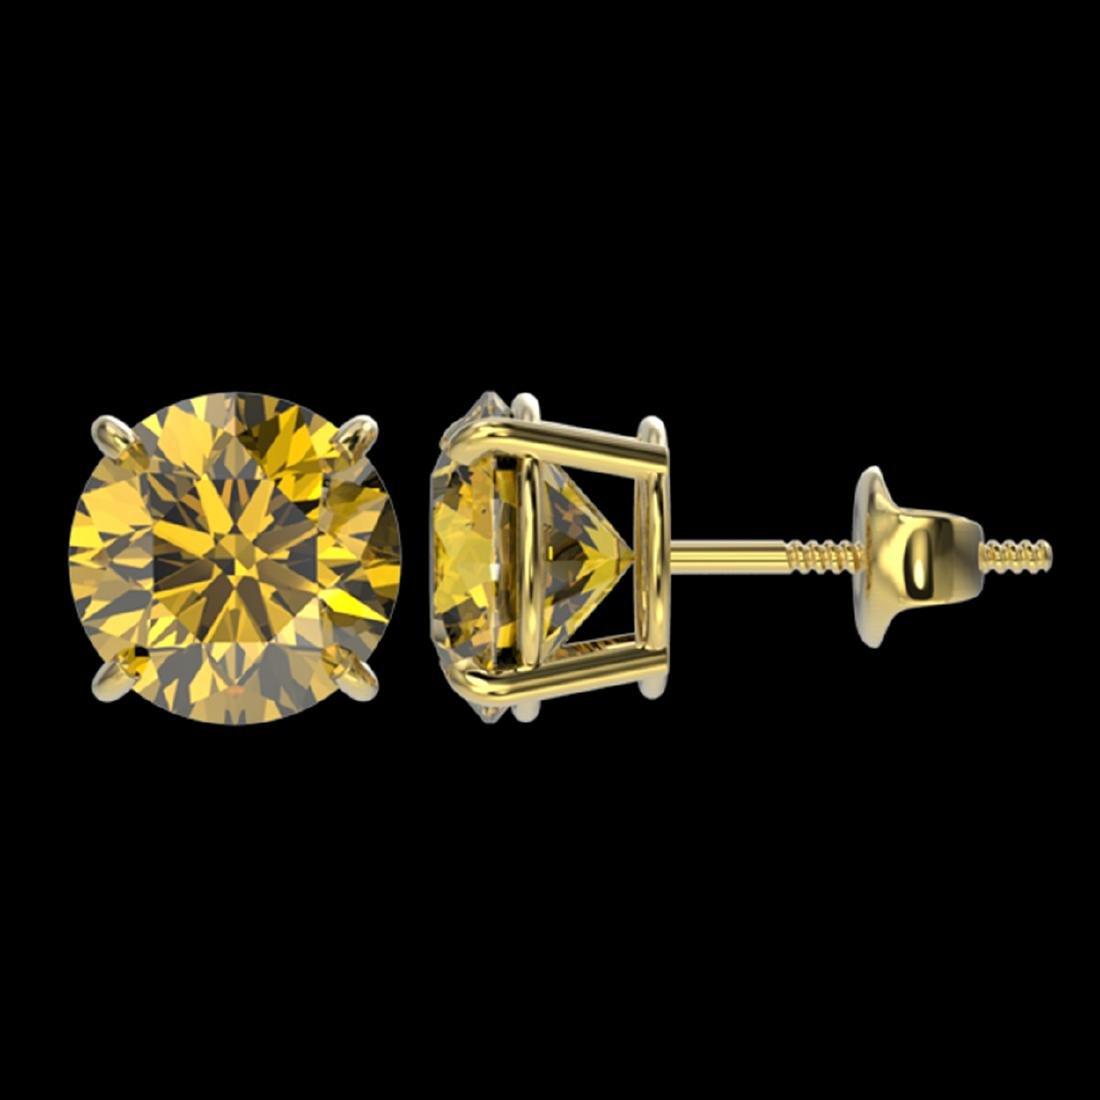 3 ctw Intense Yellow Diamond Stud Earrings 10K Yellow - 2